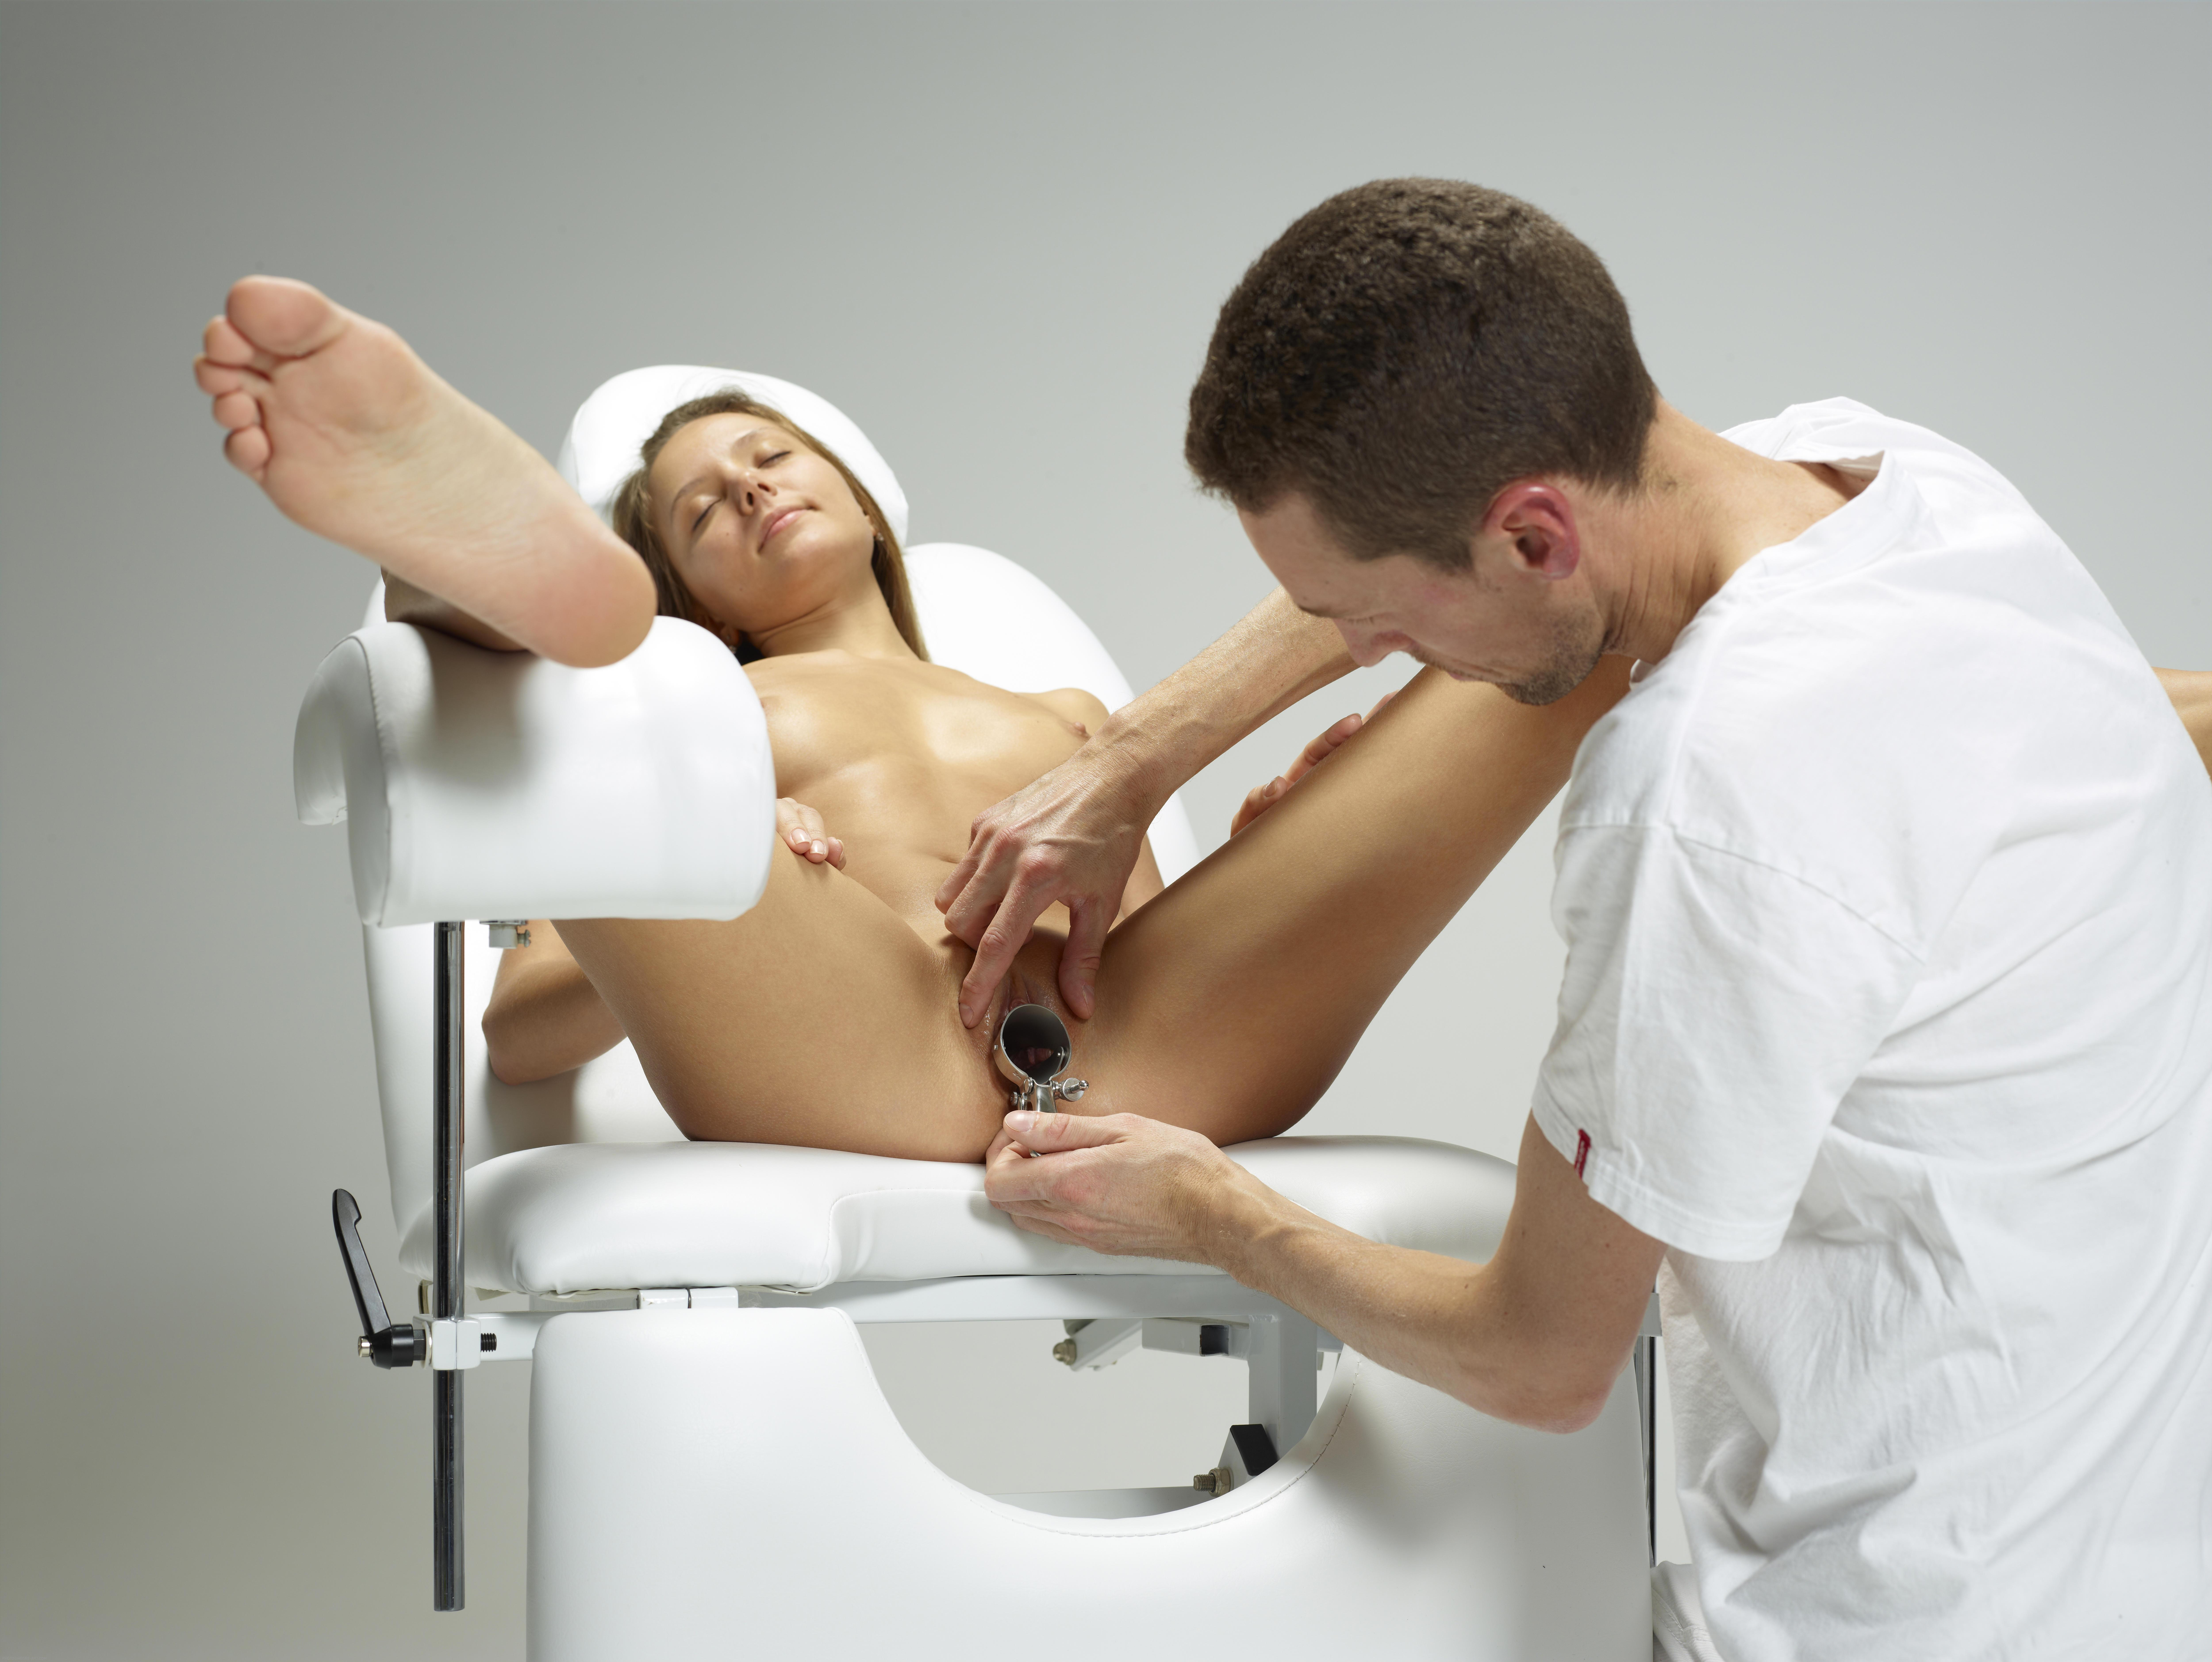 Teen vaginal exam video